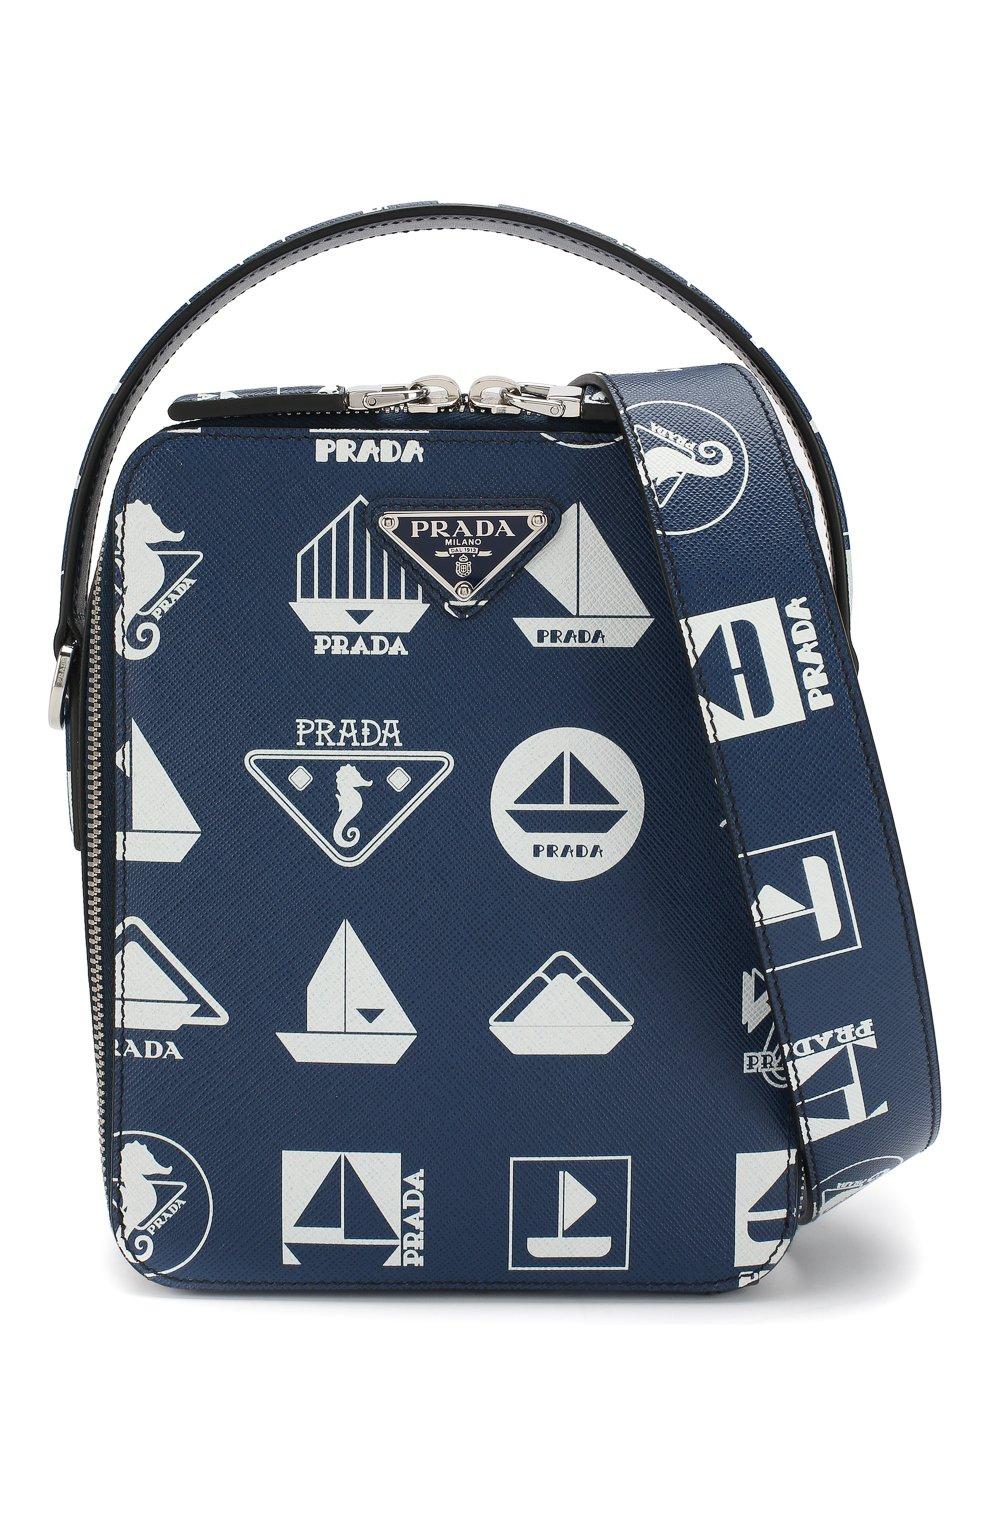 422b0ea8f78b Мужские сумки по цене от 7 320 руб. купить в интернет-магазине ЦУМ